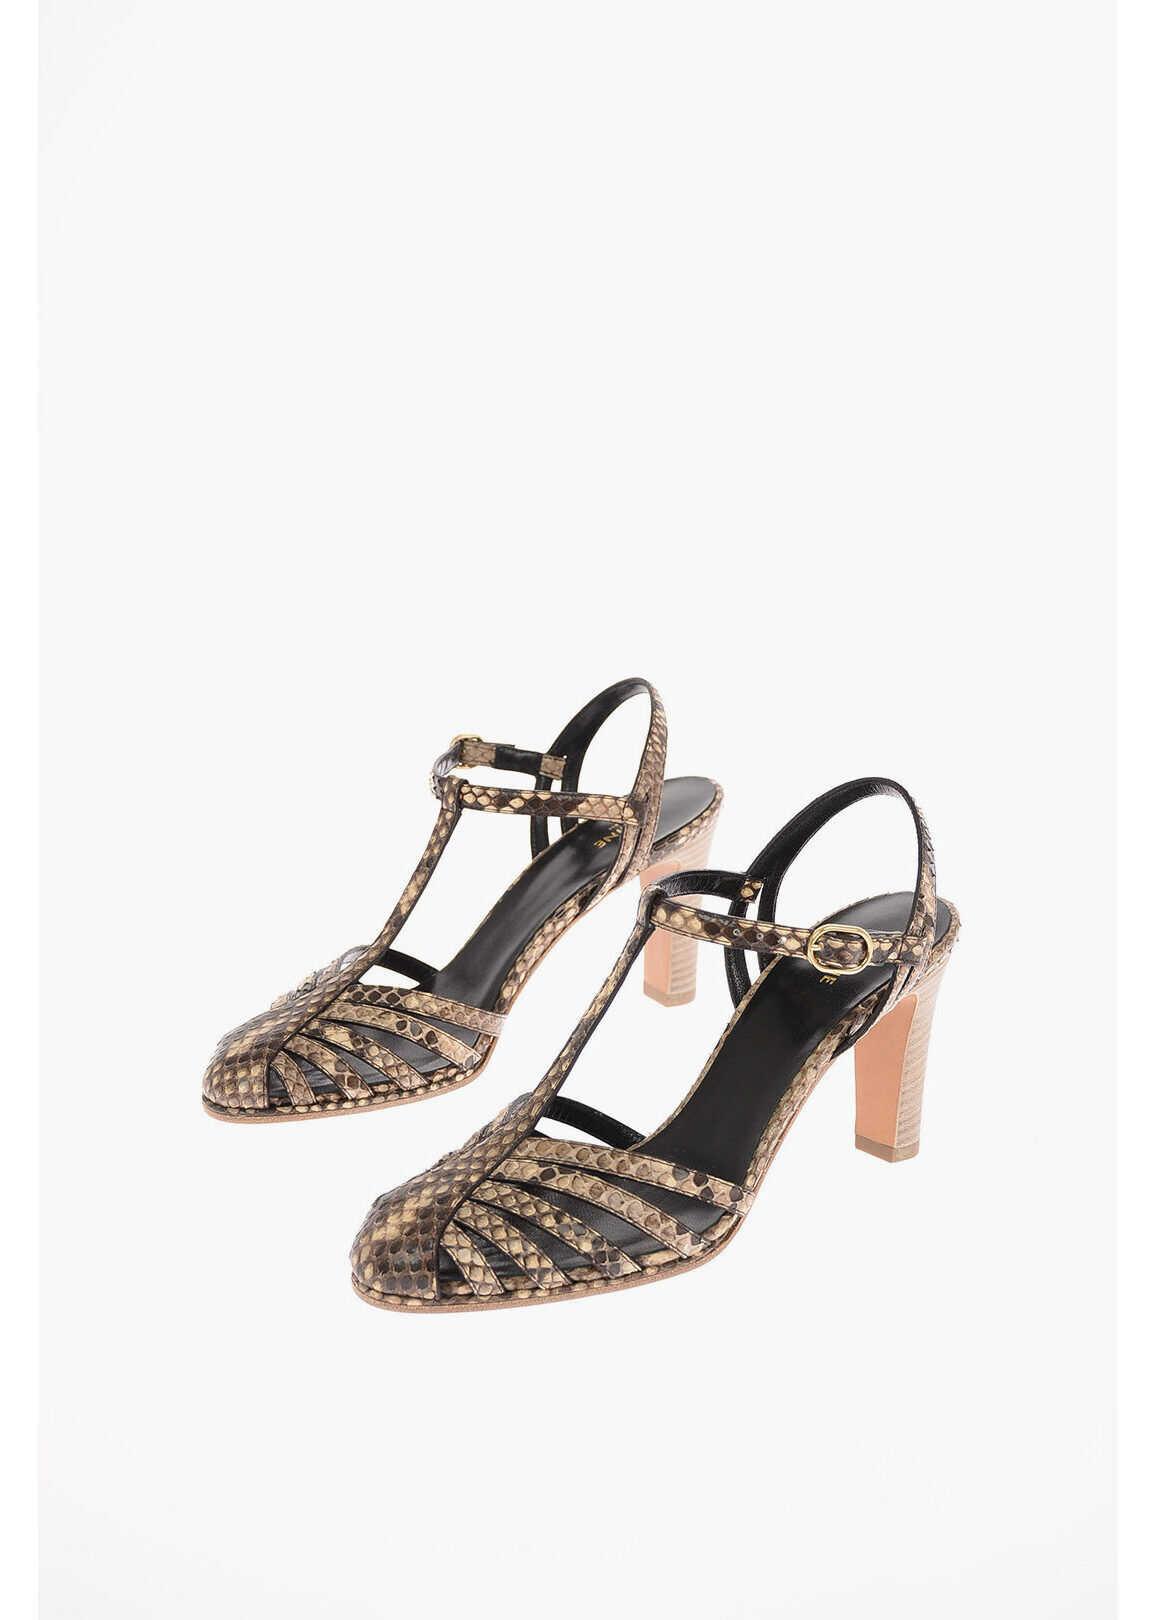 Céline Python Skin Sandals with Ankle Strap 10 Cm BROWN imagine b-mall.ro